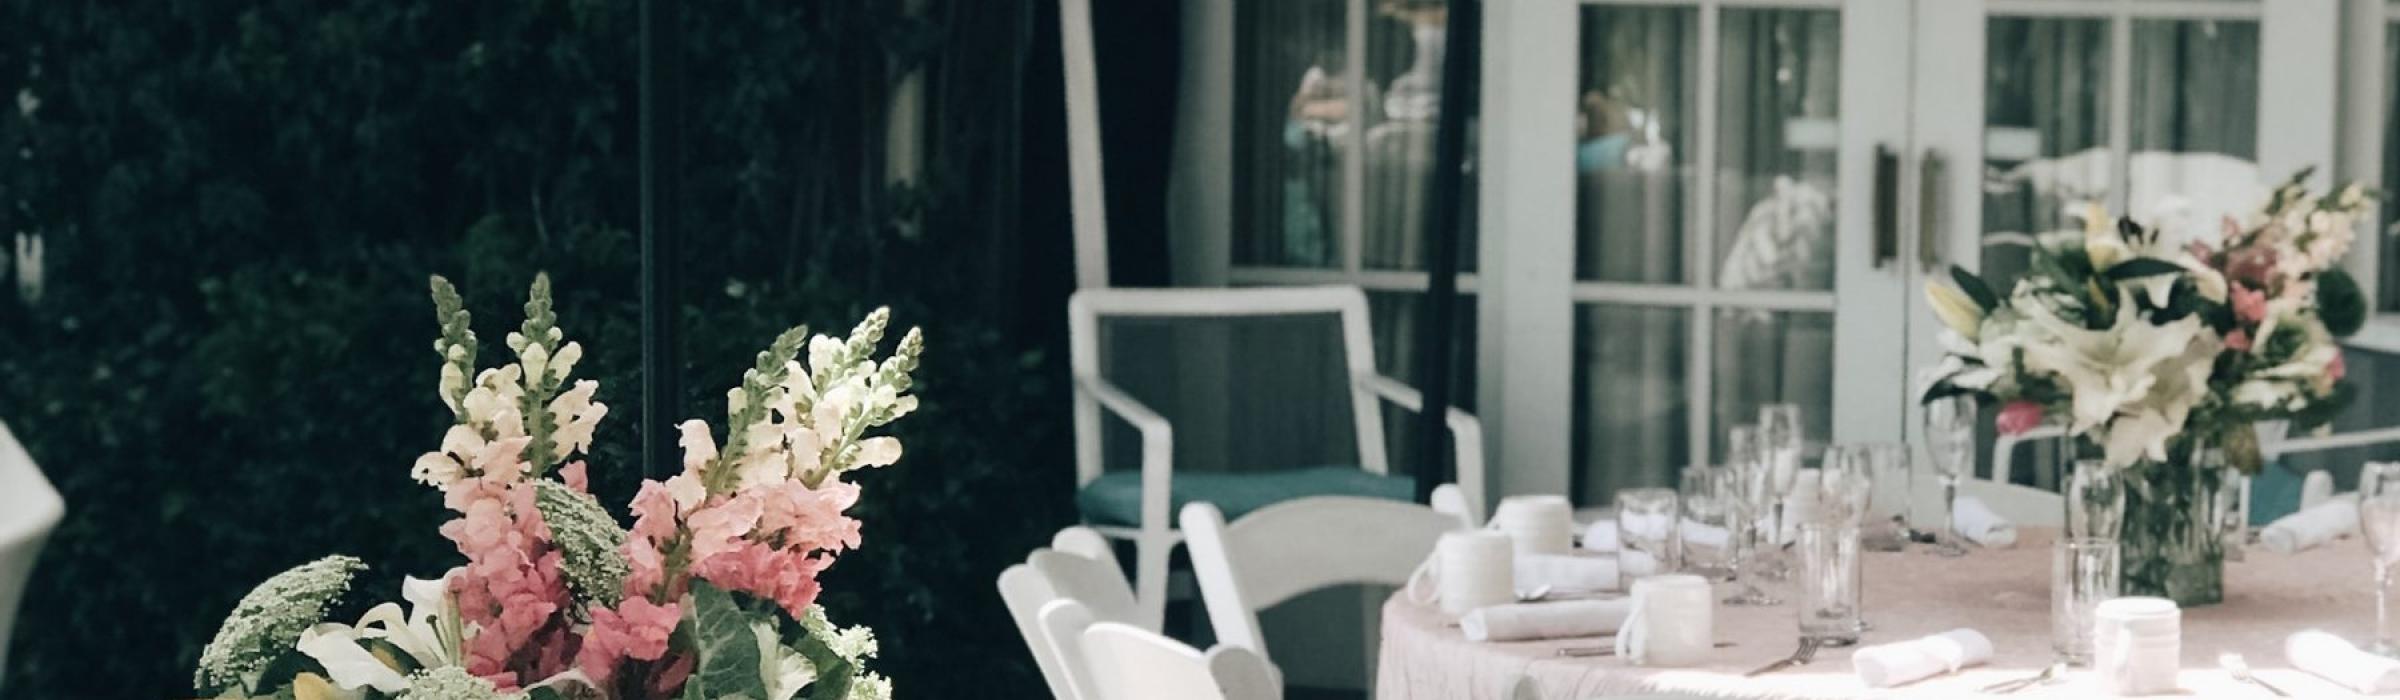 Beverly Hills Bridal Shower